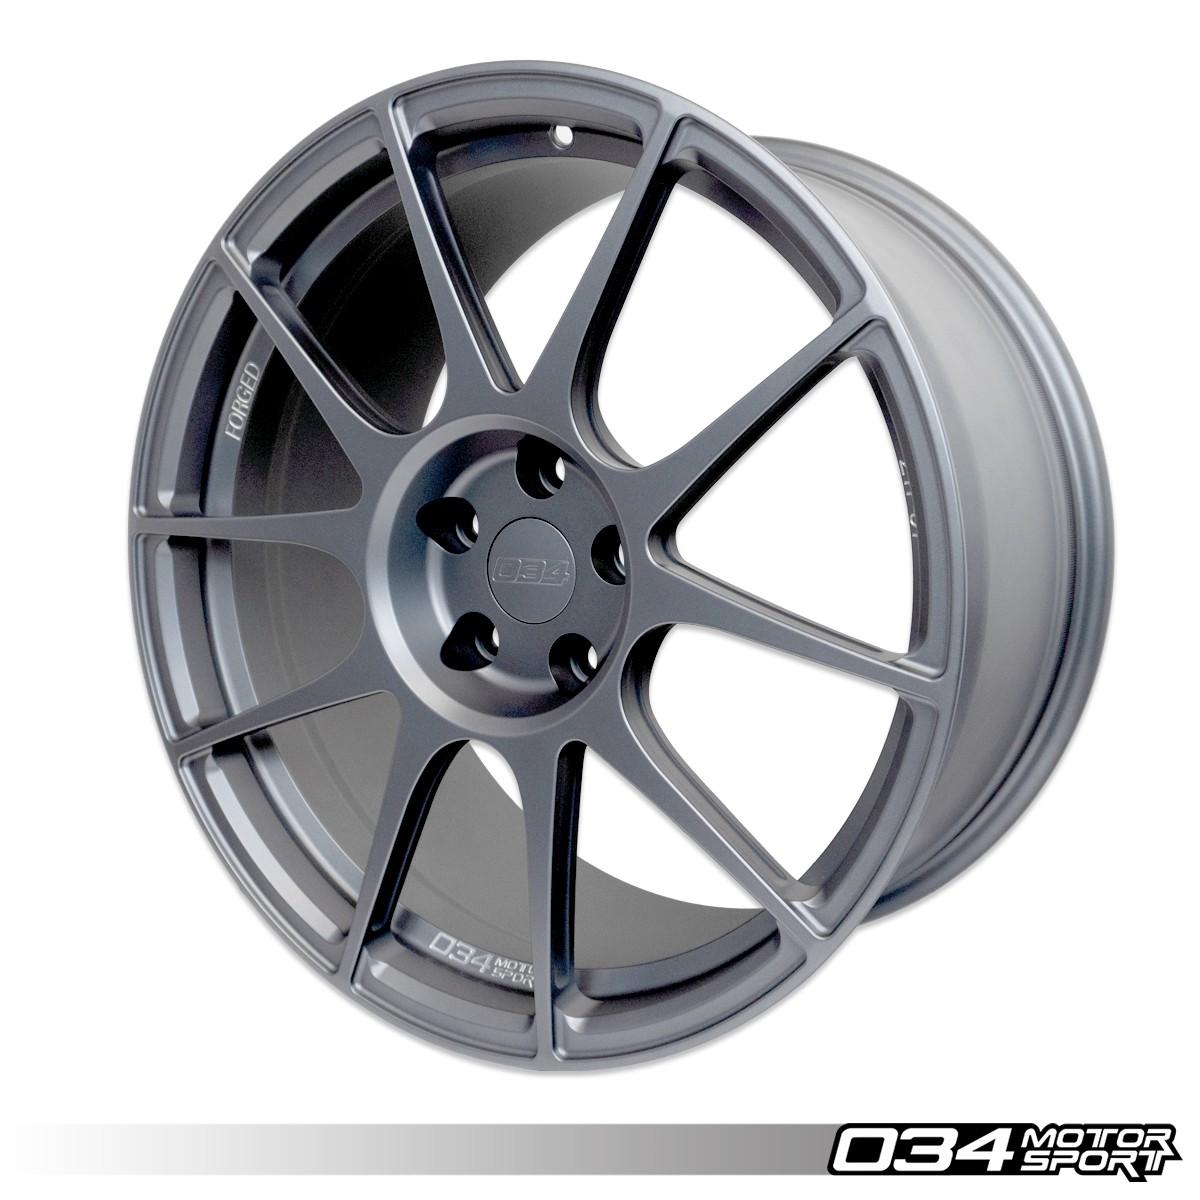 ZTF-01 Forged Wheel, 19x9.3 ET42, 57.1MM Bore, Audi 8V/8V.5 RS3 & Audi 8J/8S TT/TTS/TTRS 034-604-0003